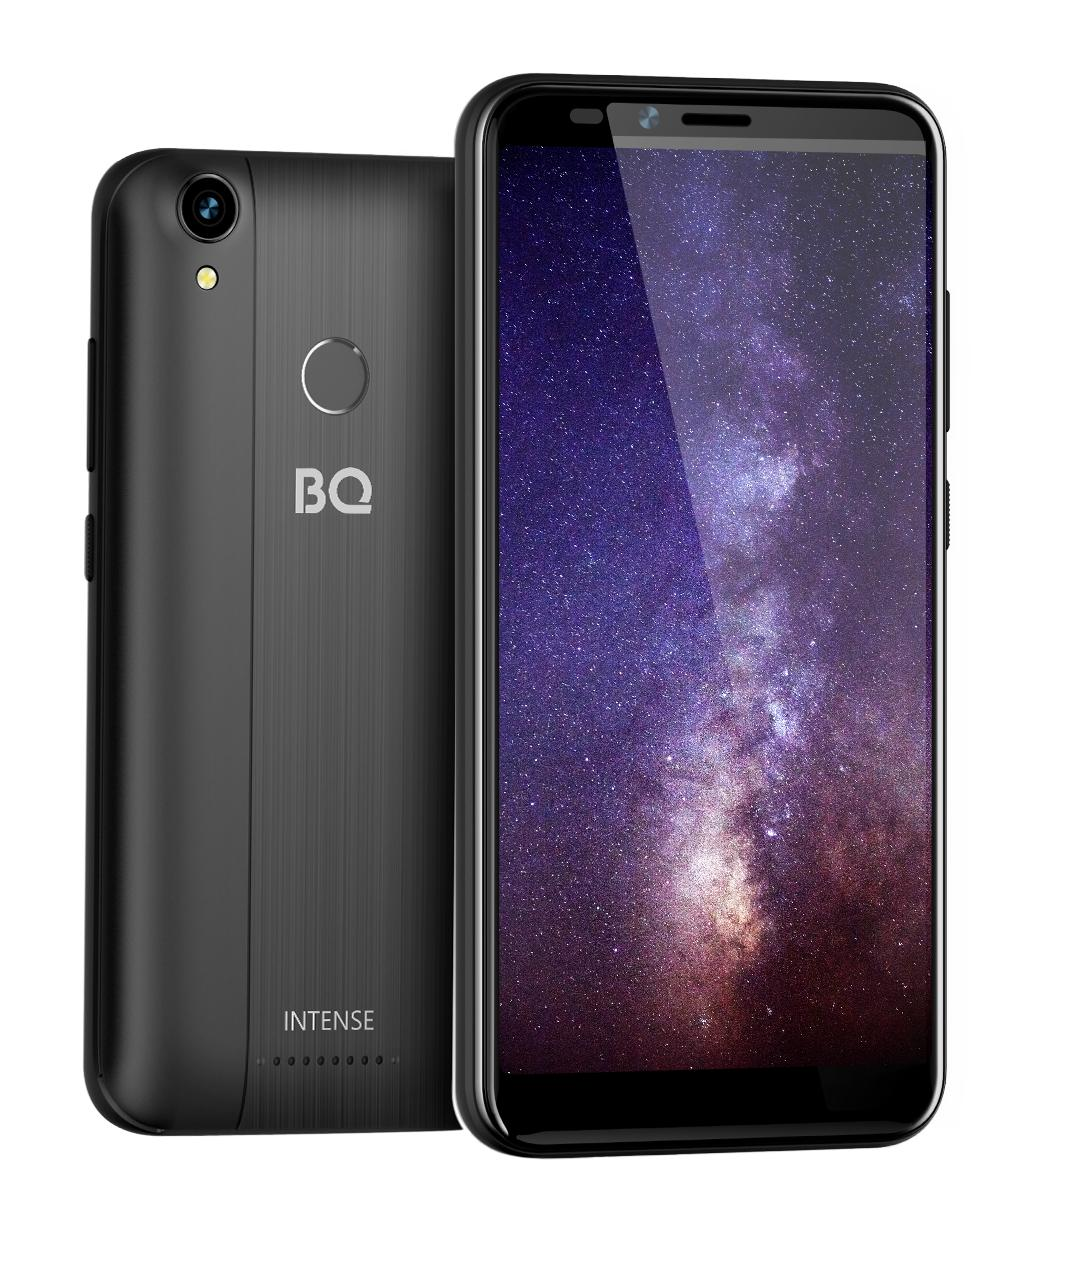 BQпредлагает смартфон саккумулятором на8000 мАч — Intense 5530L